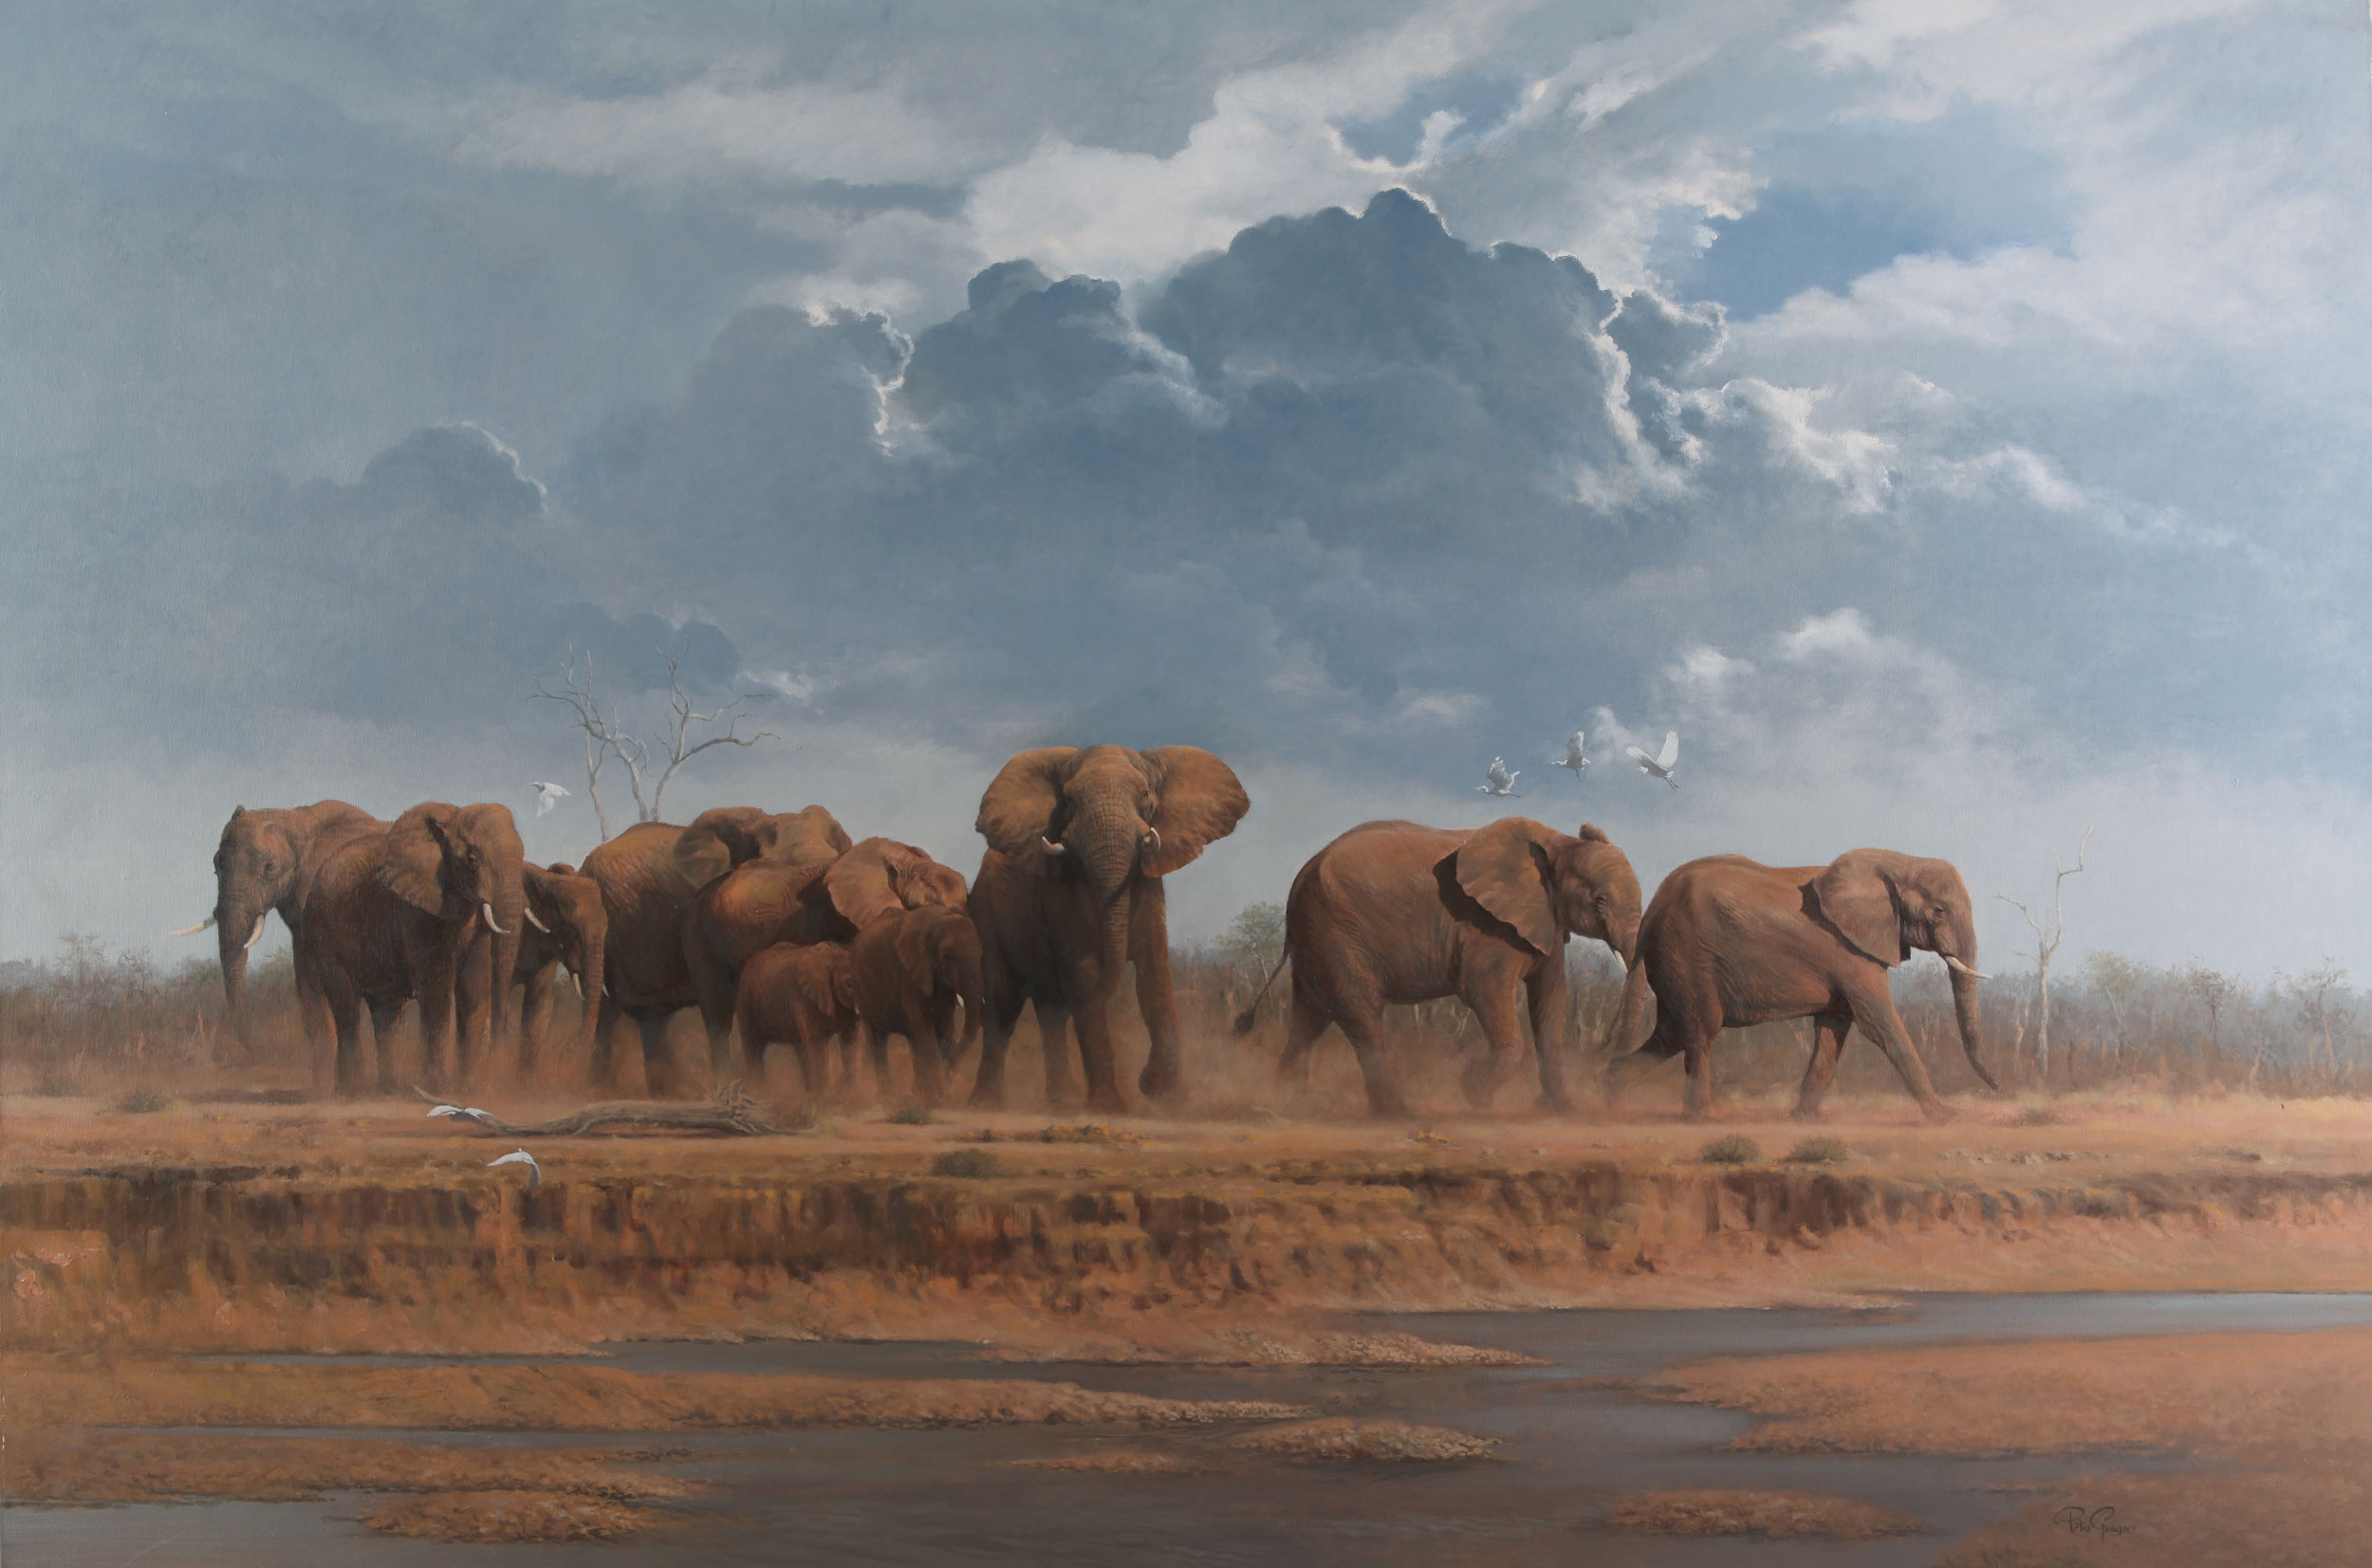 Matriarchal-Herd